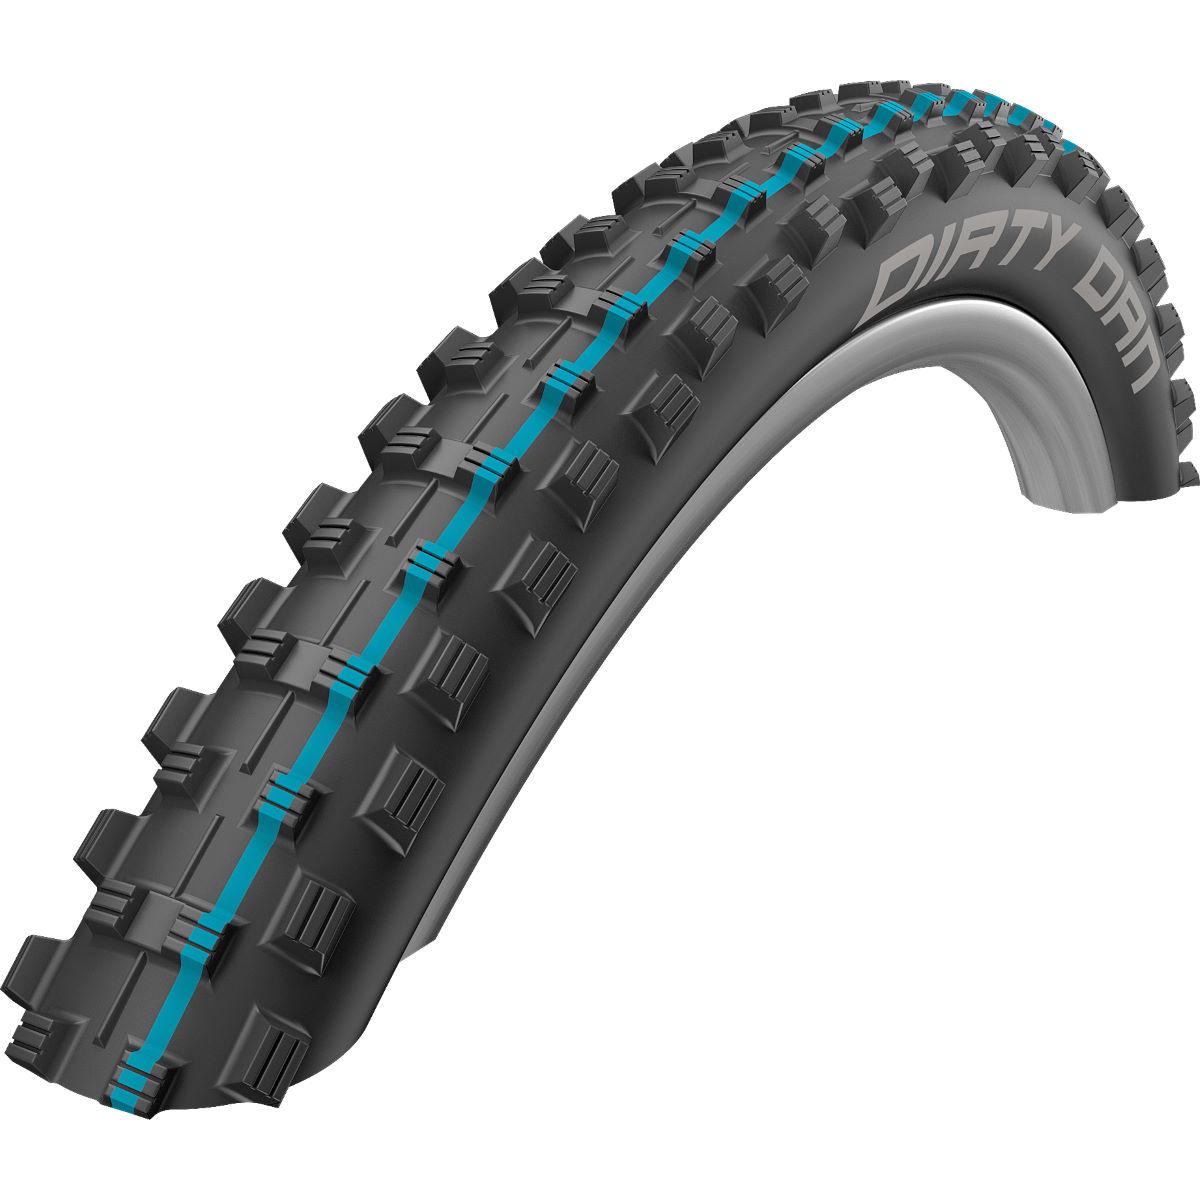 40% Off Schwalbe Dirty Dan Addix MTB Tyre - LiteSkin. Free delivery £34.99 @ Wiggle